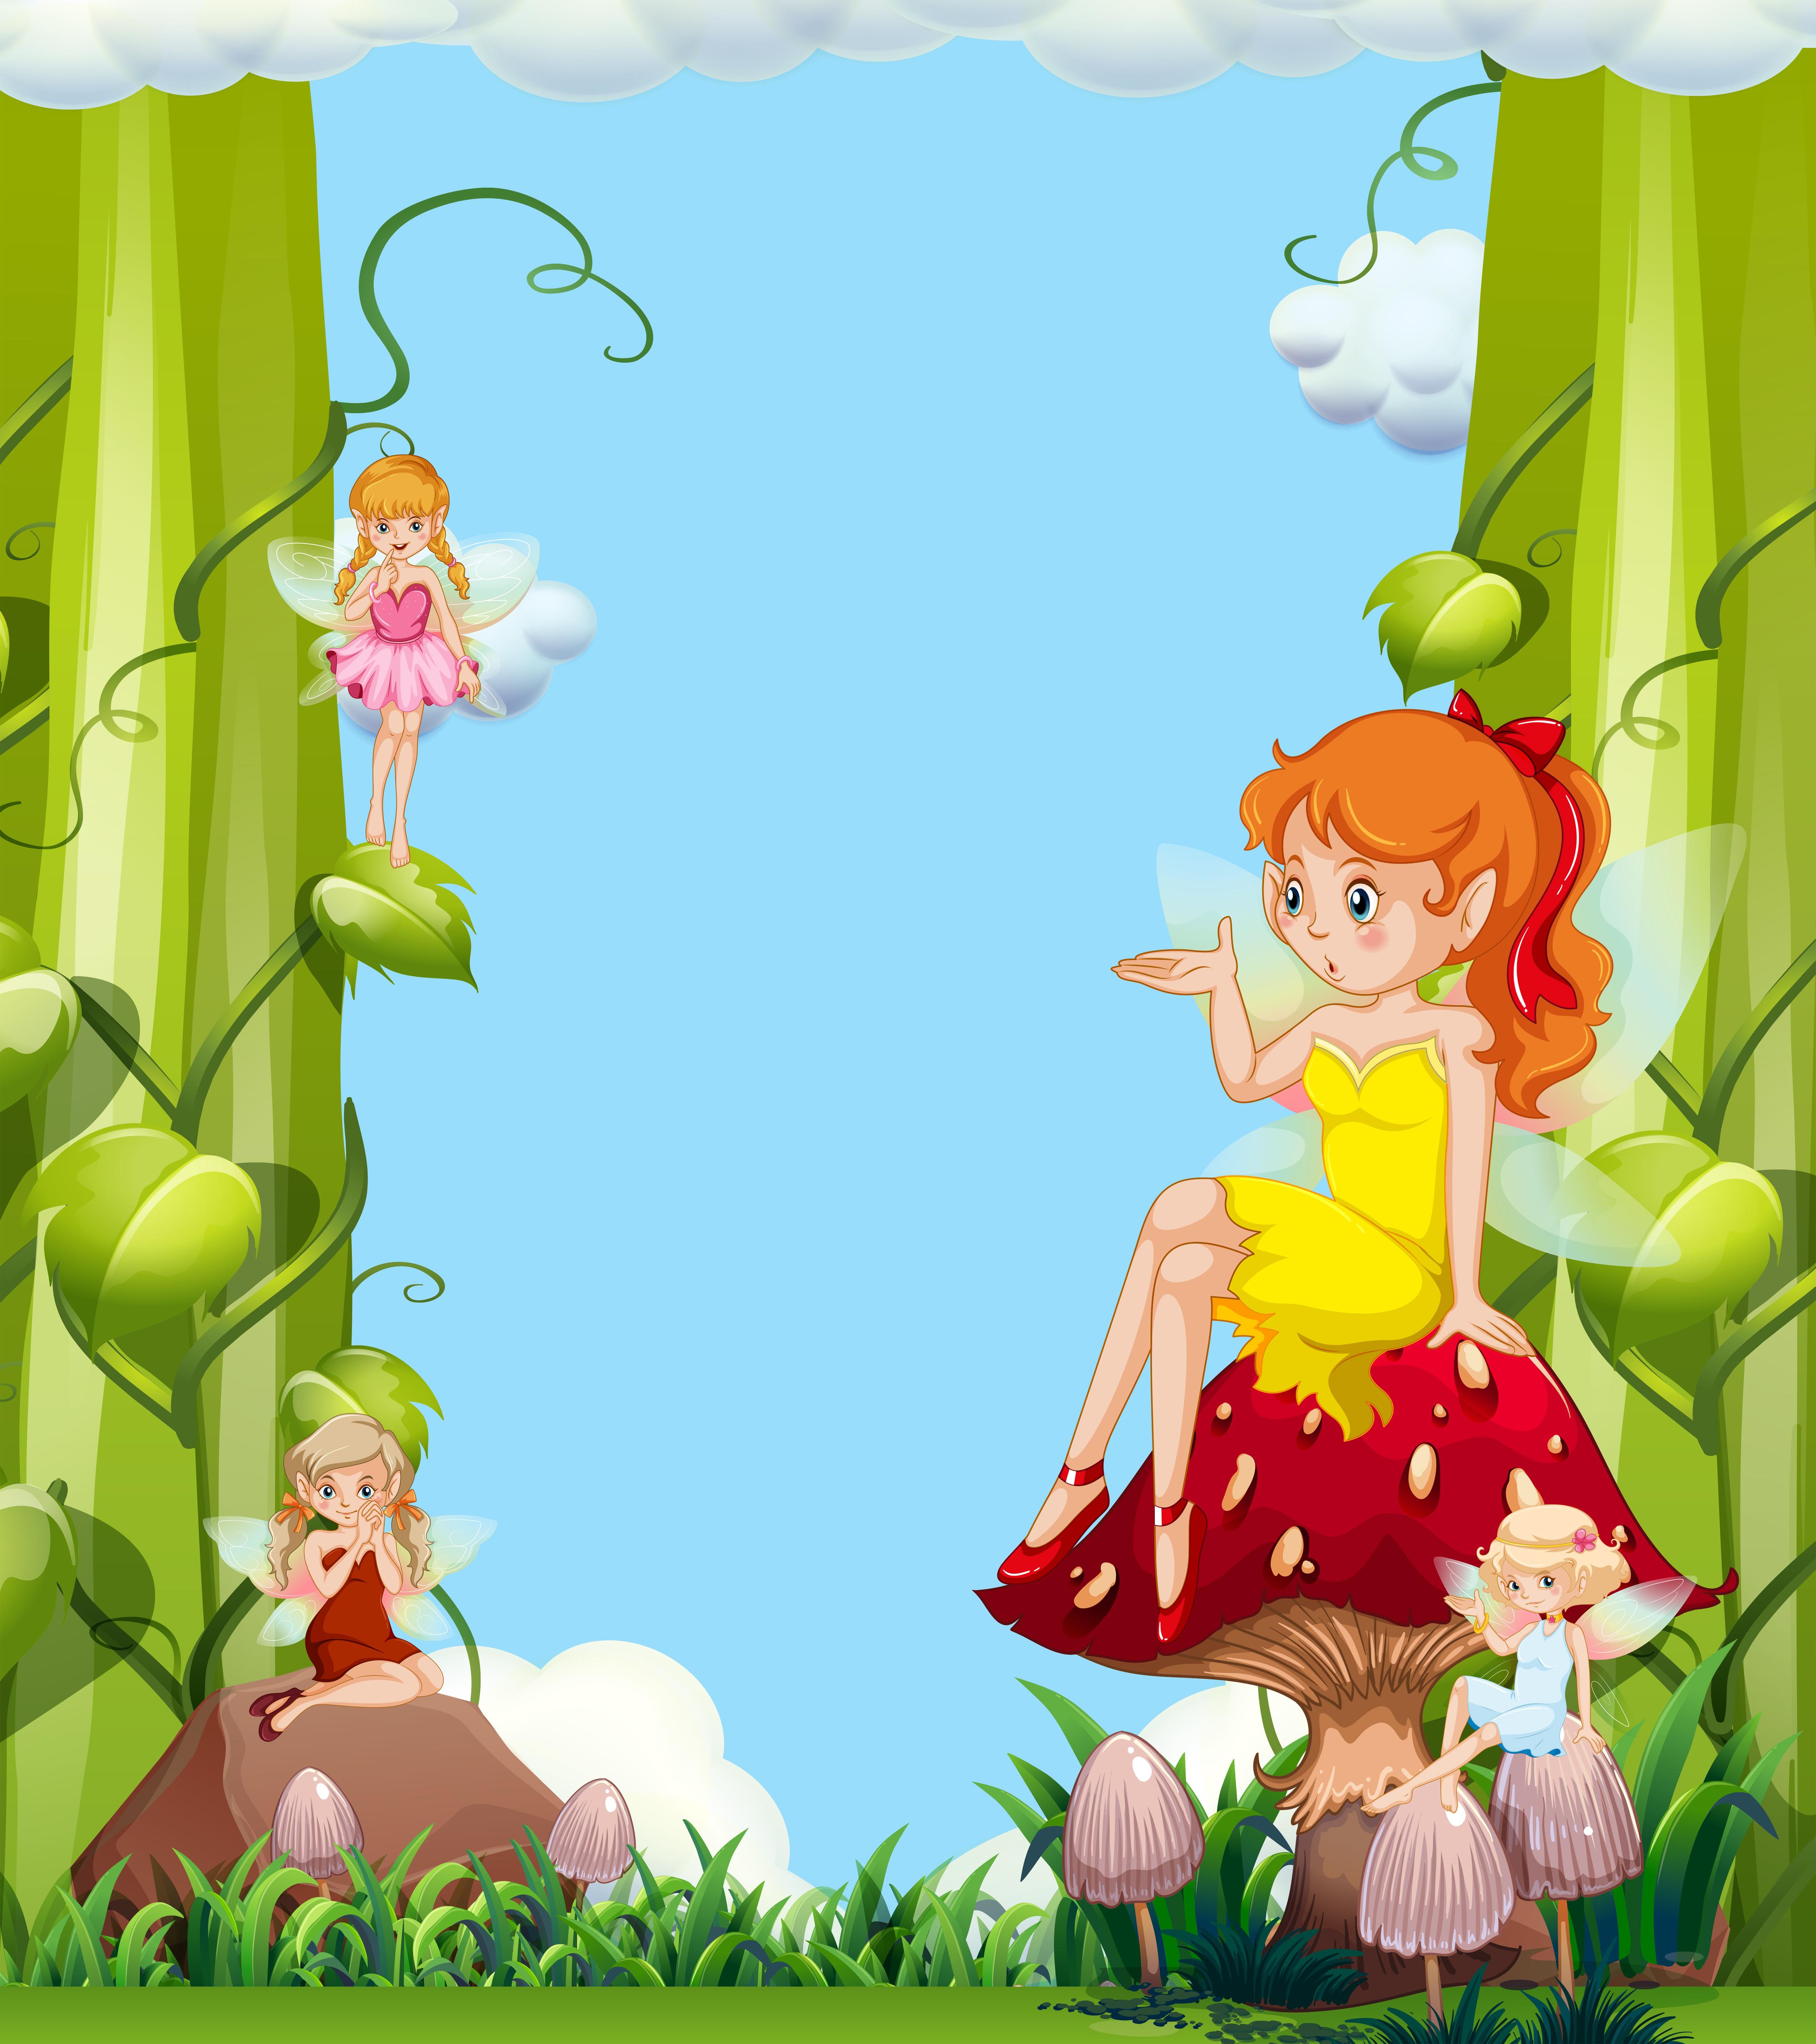 Garden Cute Cartoon: Cute Fairies In Mushroom Garden